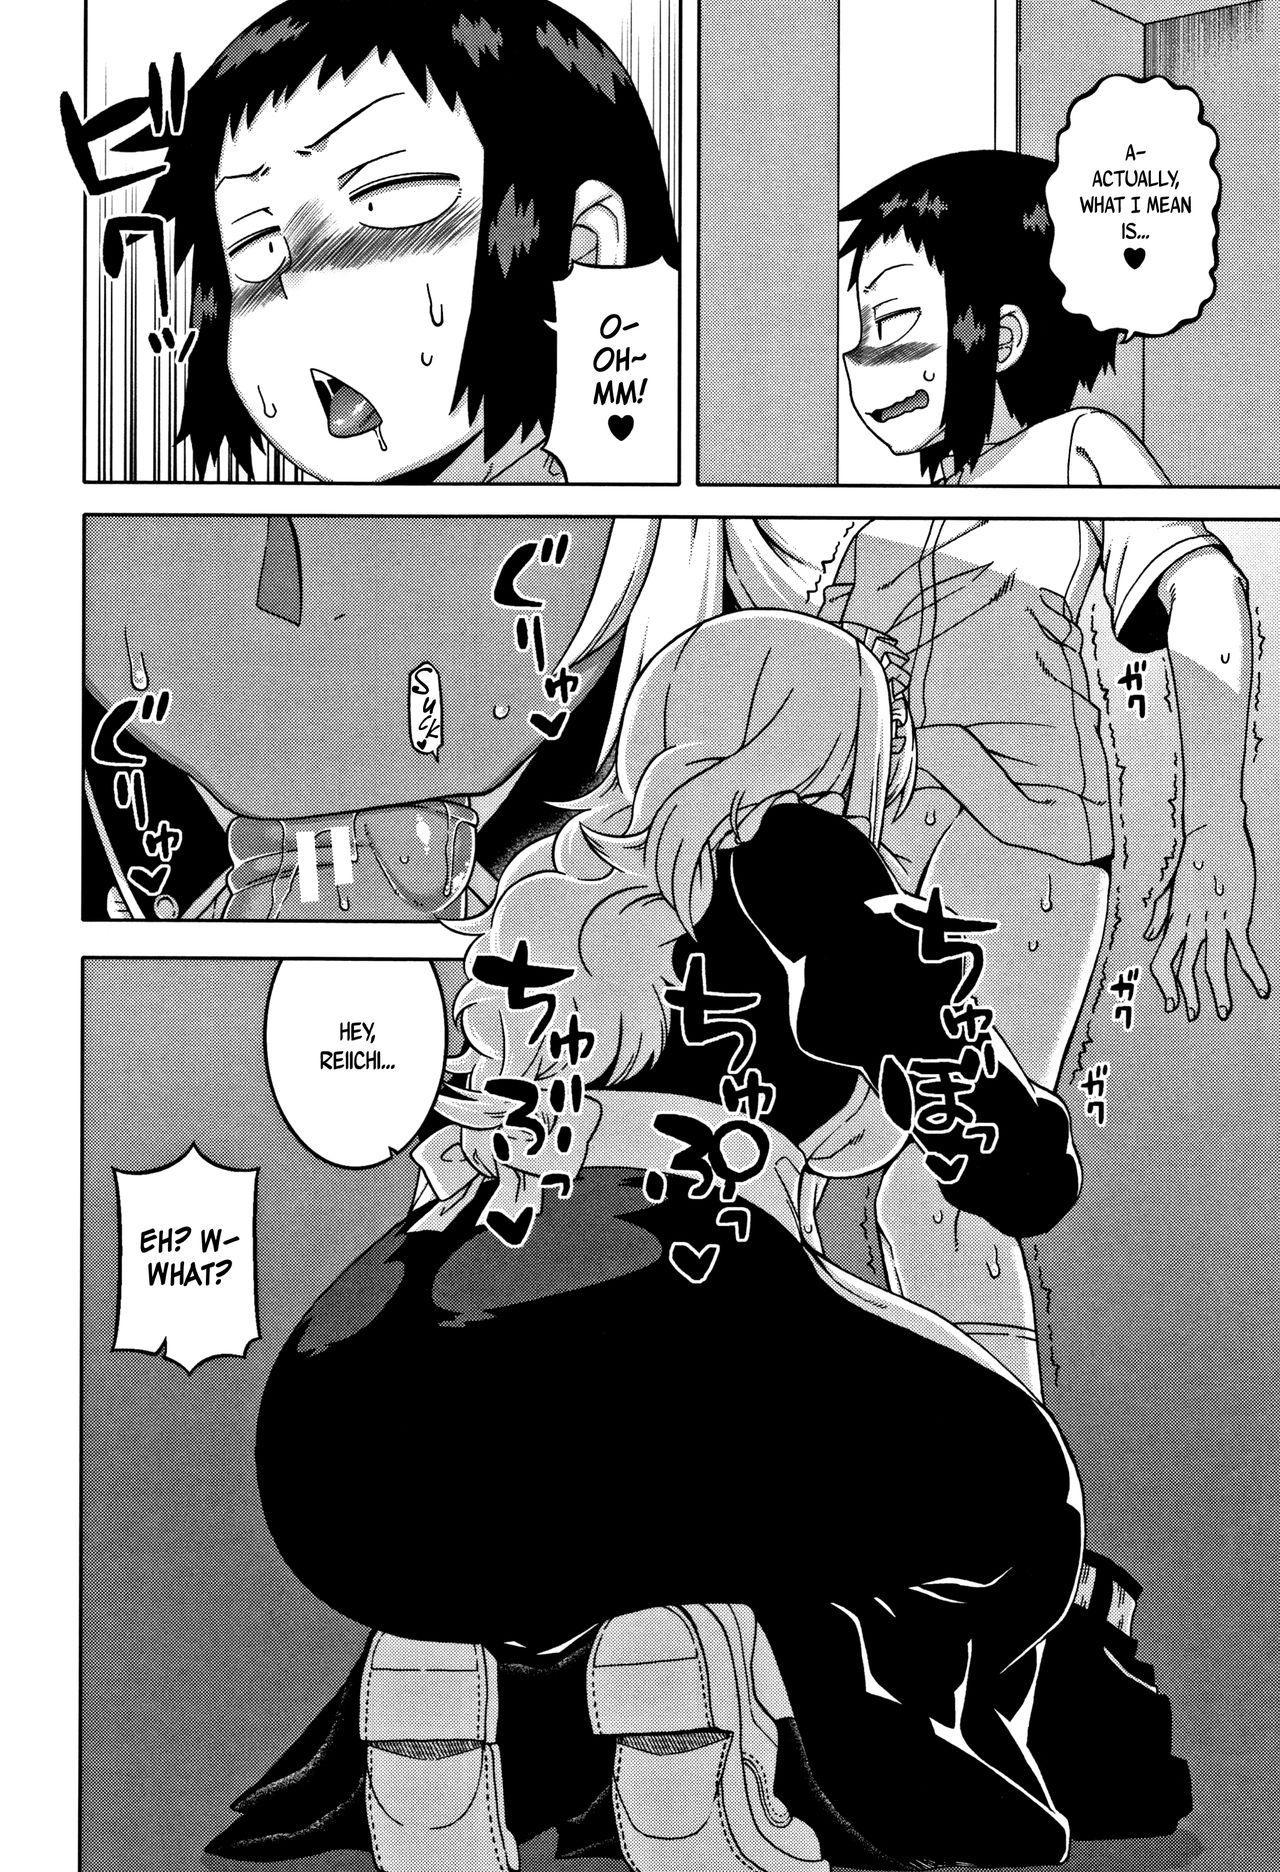 [Takatsu] Hitozuma A-san to Musuko no Yuujin N-kun - Married wife A and son's friend N-kun [English] 186